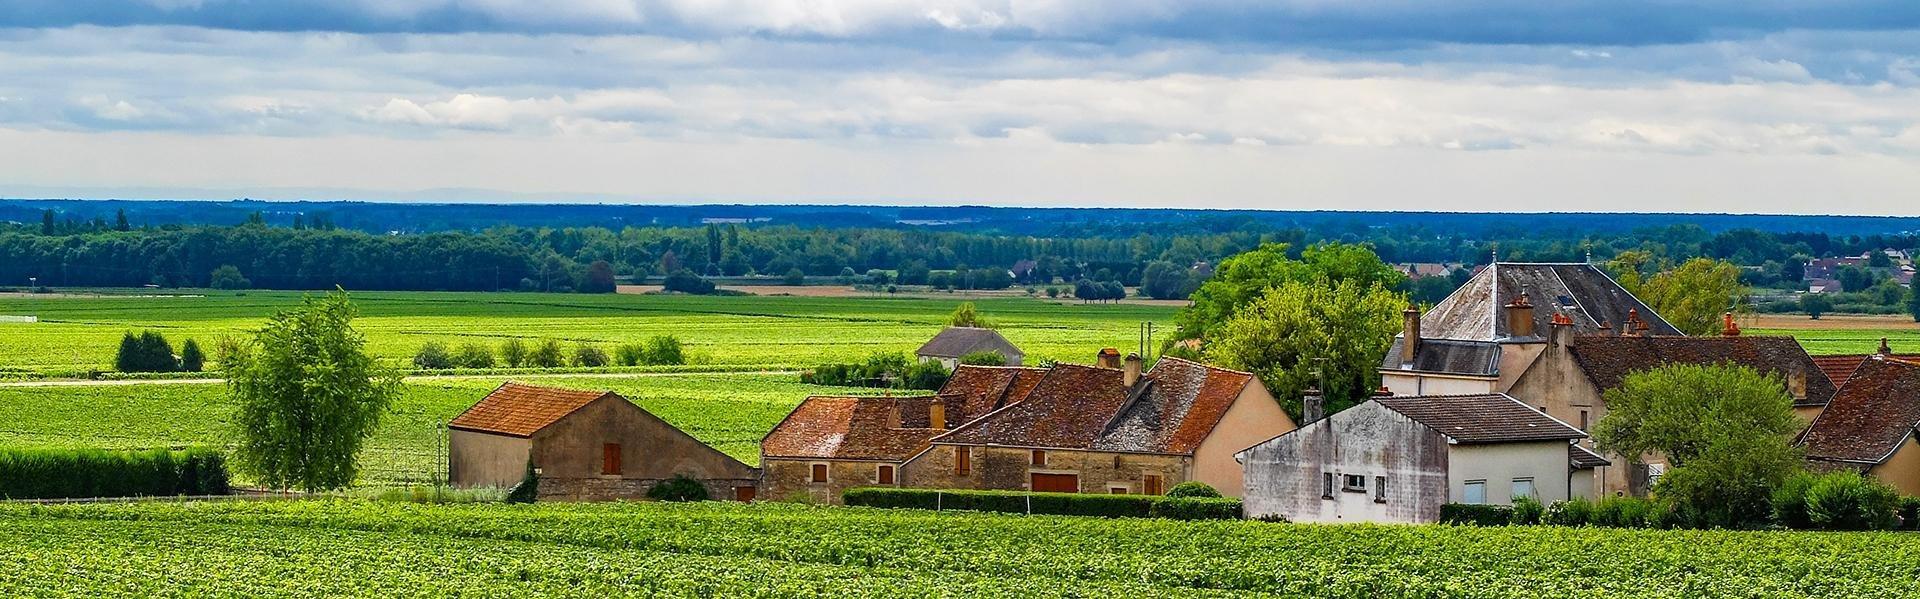 Aloxe Corton in de Bourgogne, Frankrijk